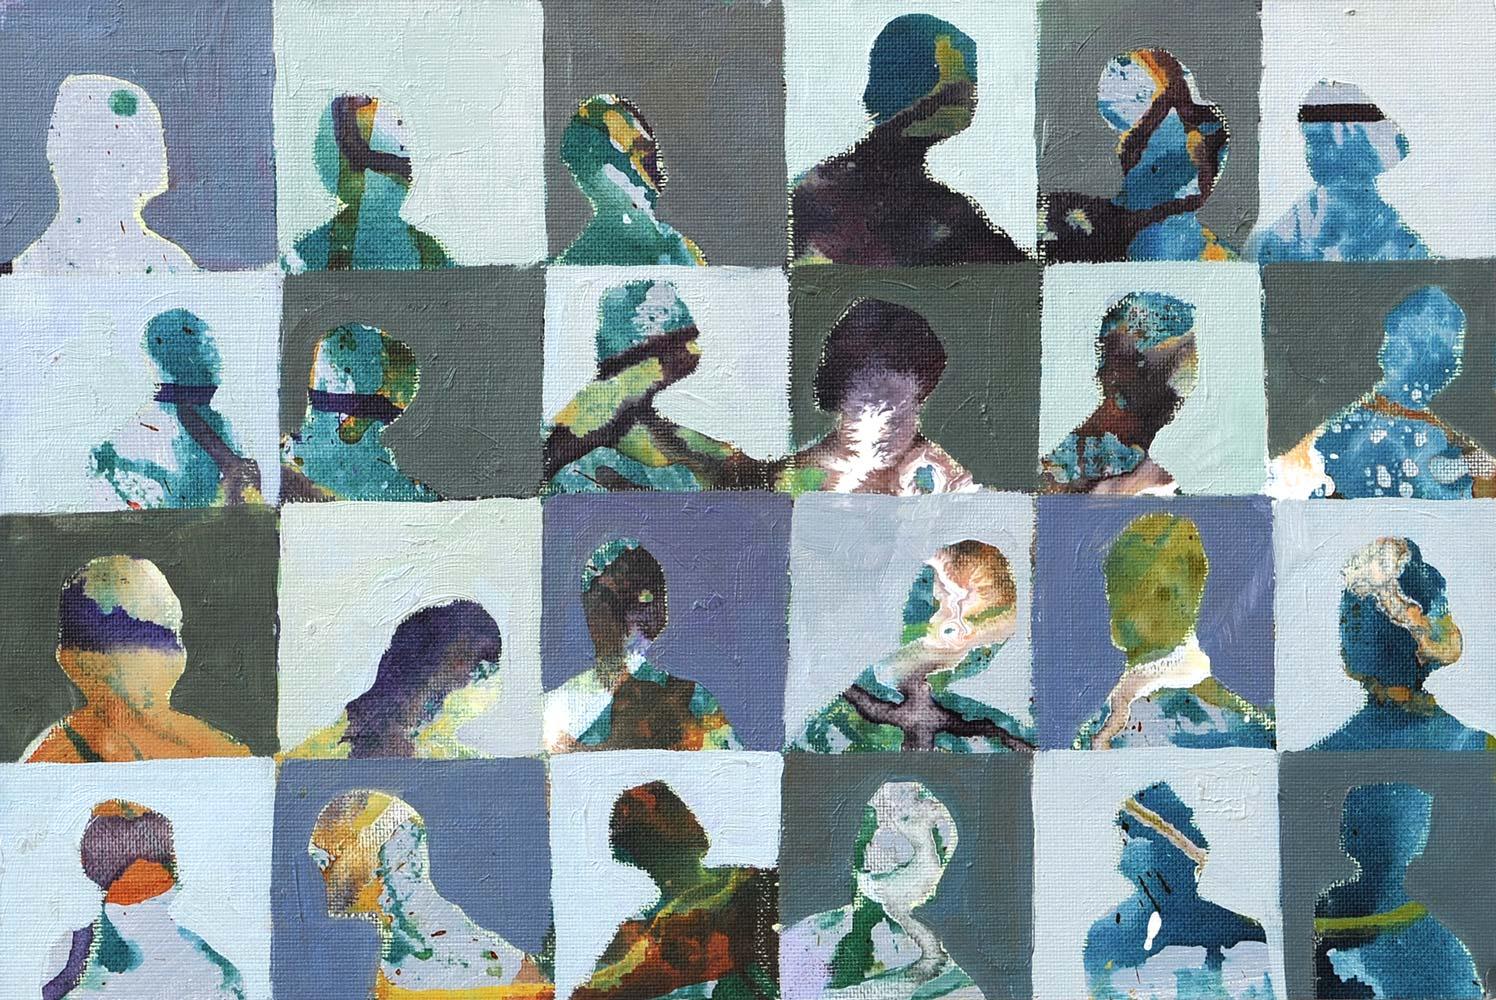 Twenty four profiles